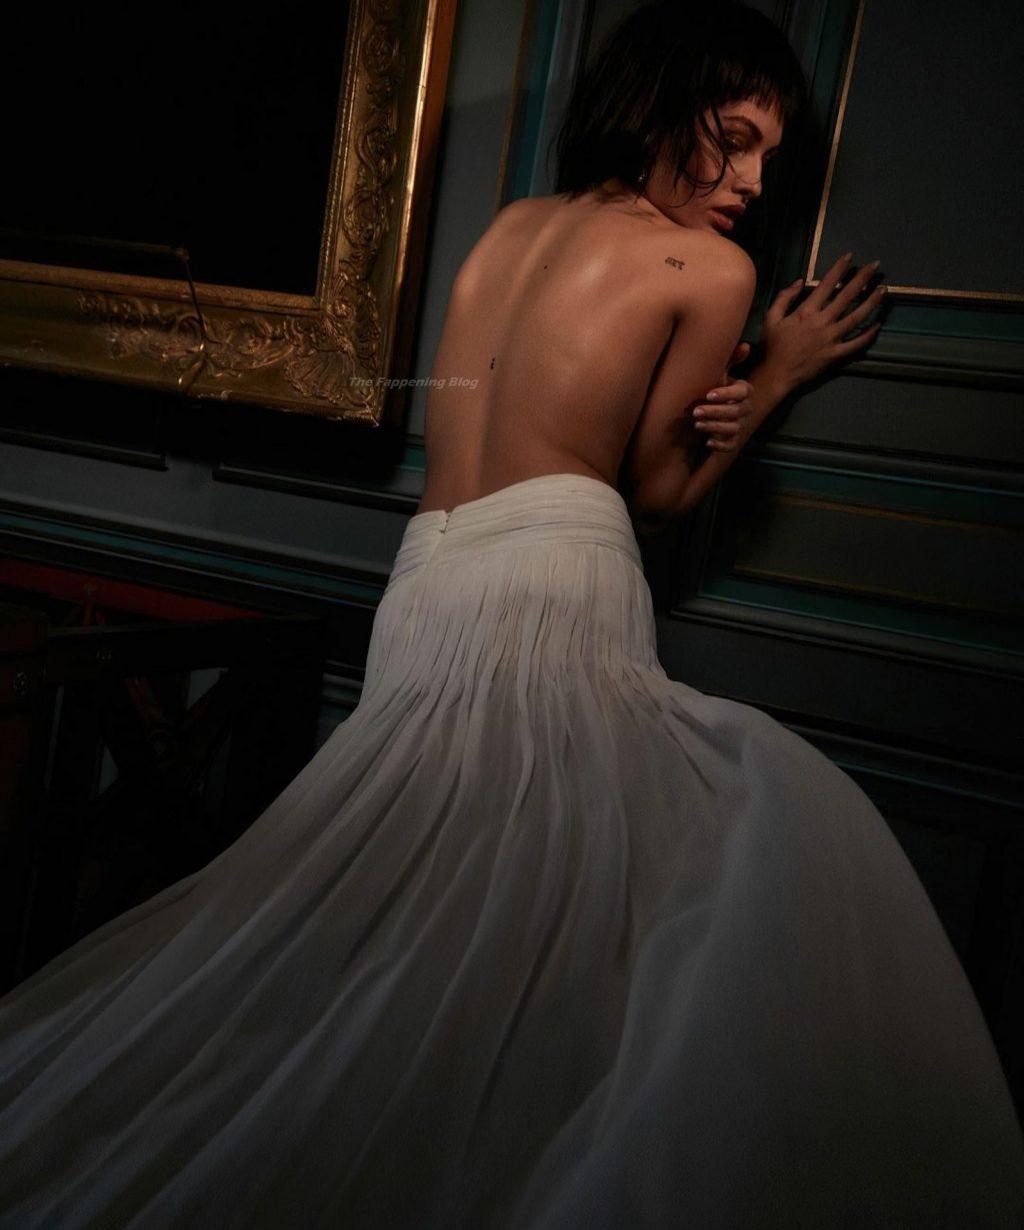 Thylane Blondeau Topless